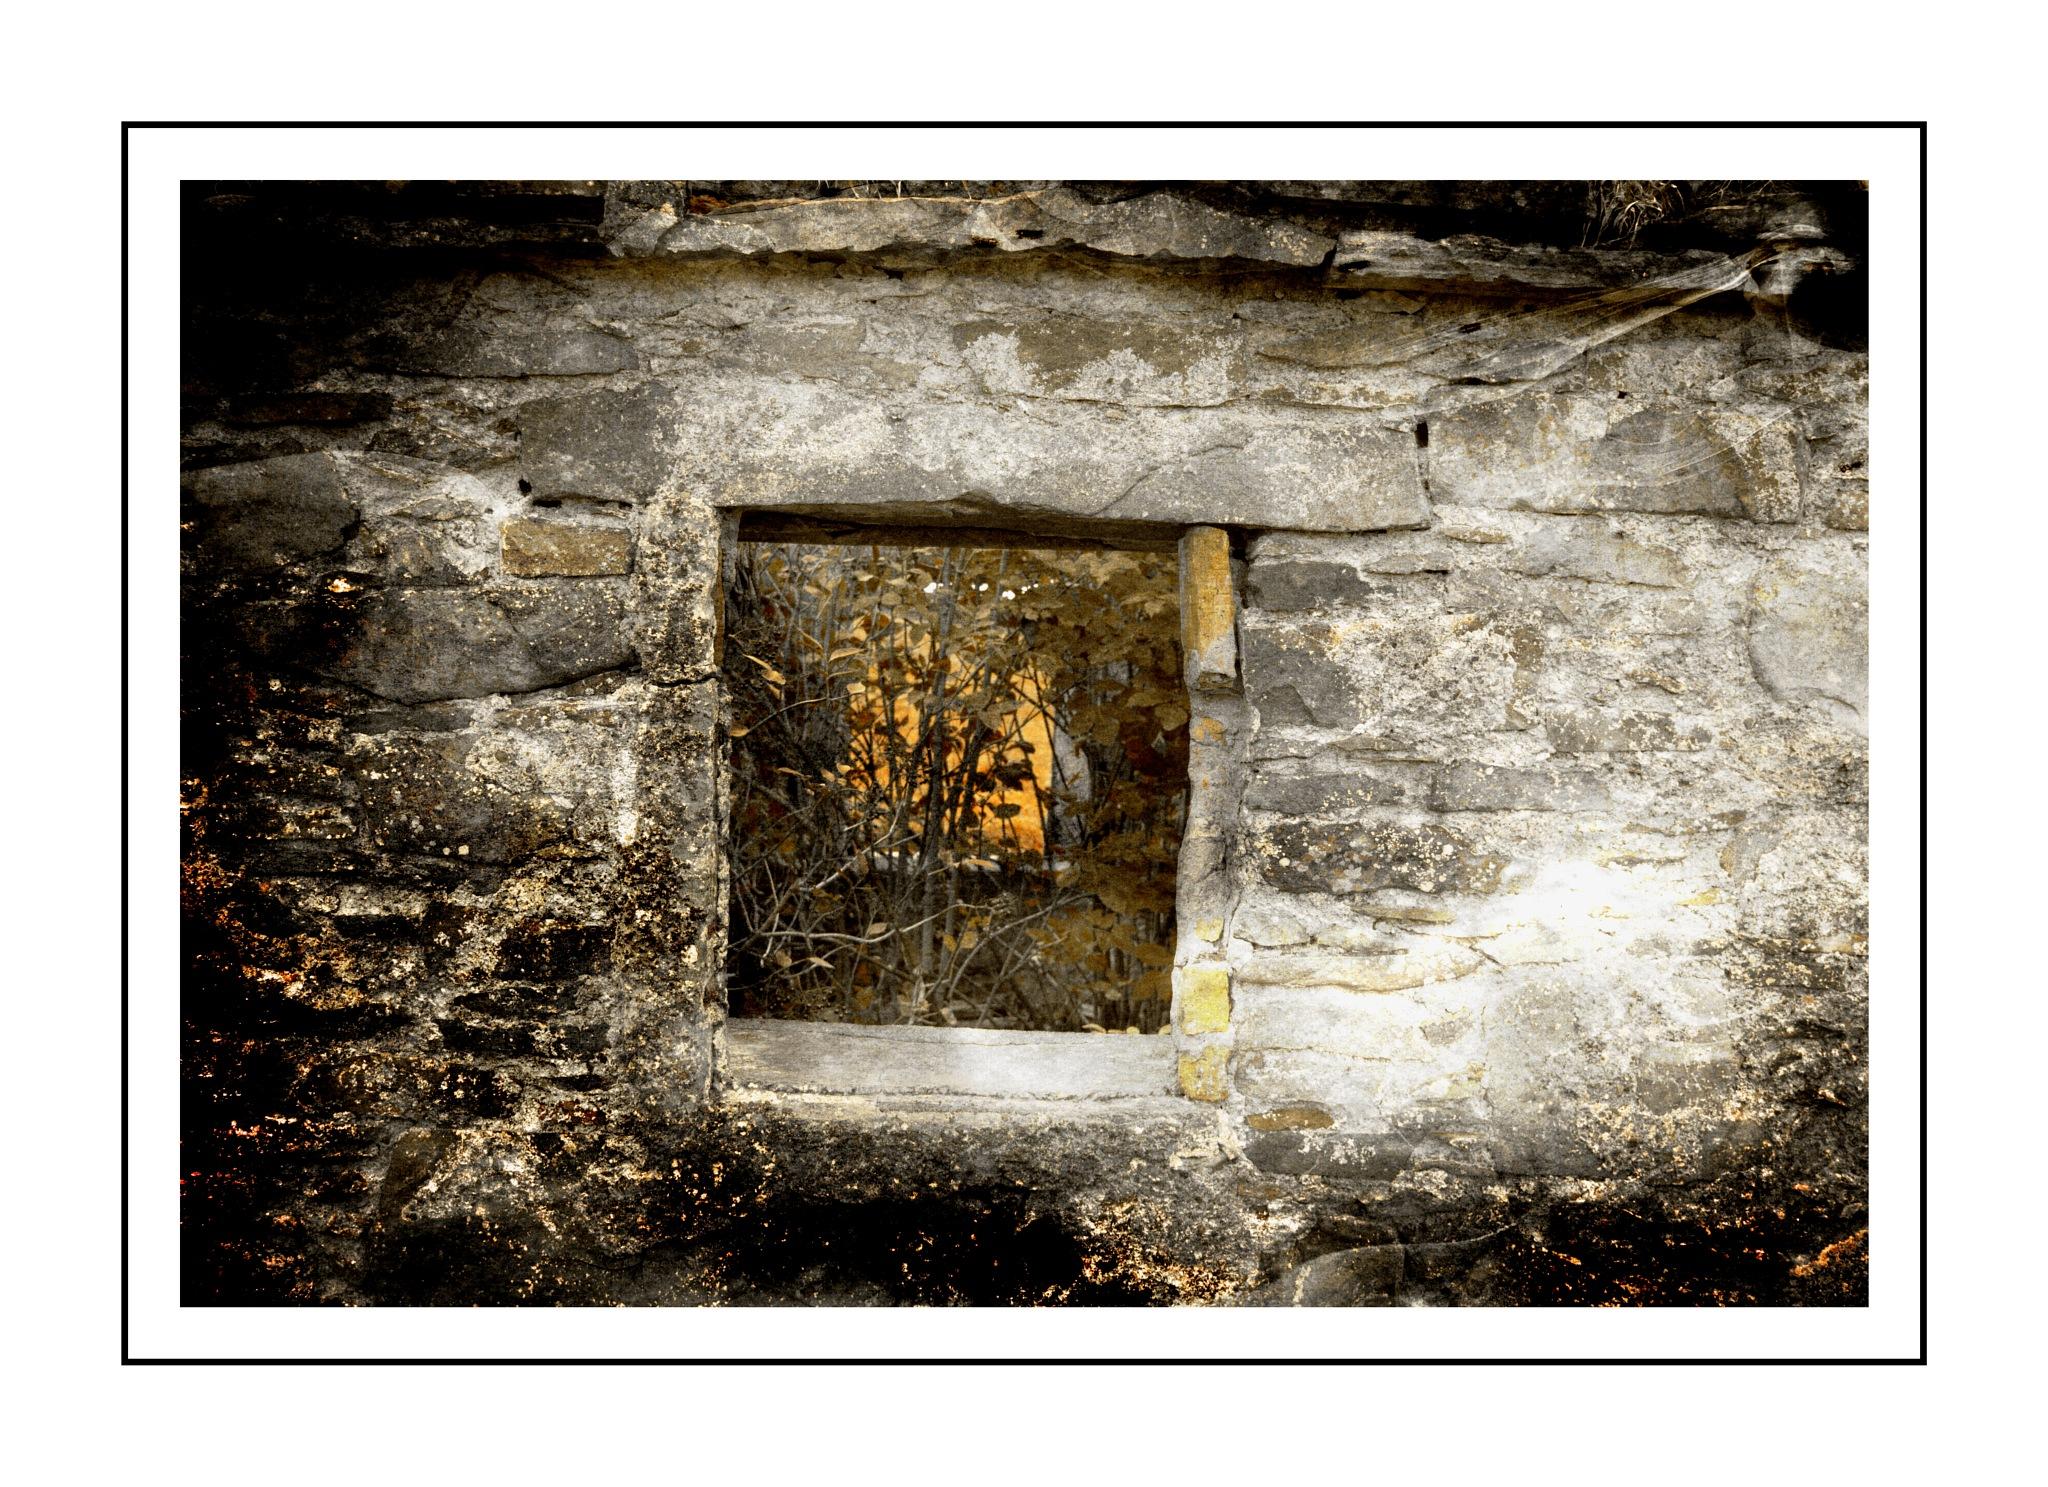 through the window by Jason Clarke